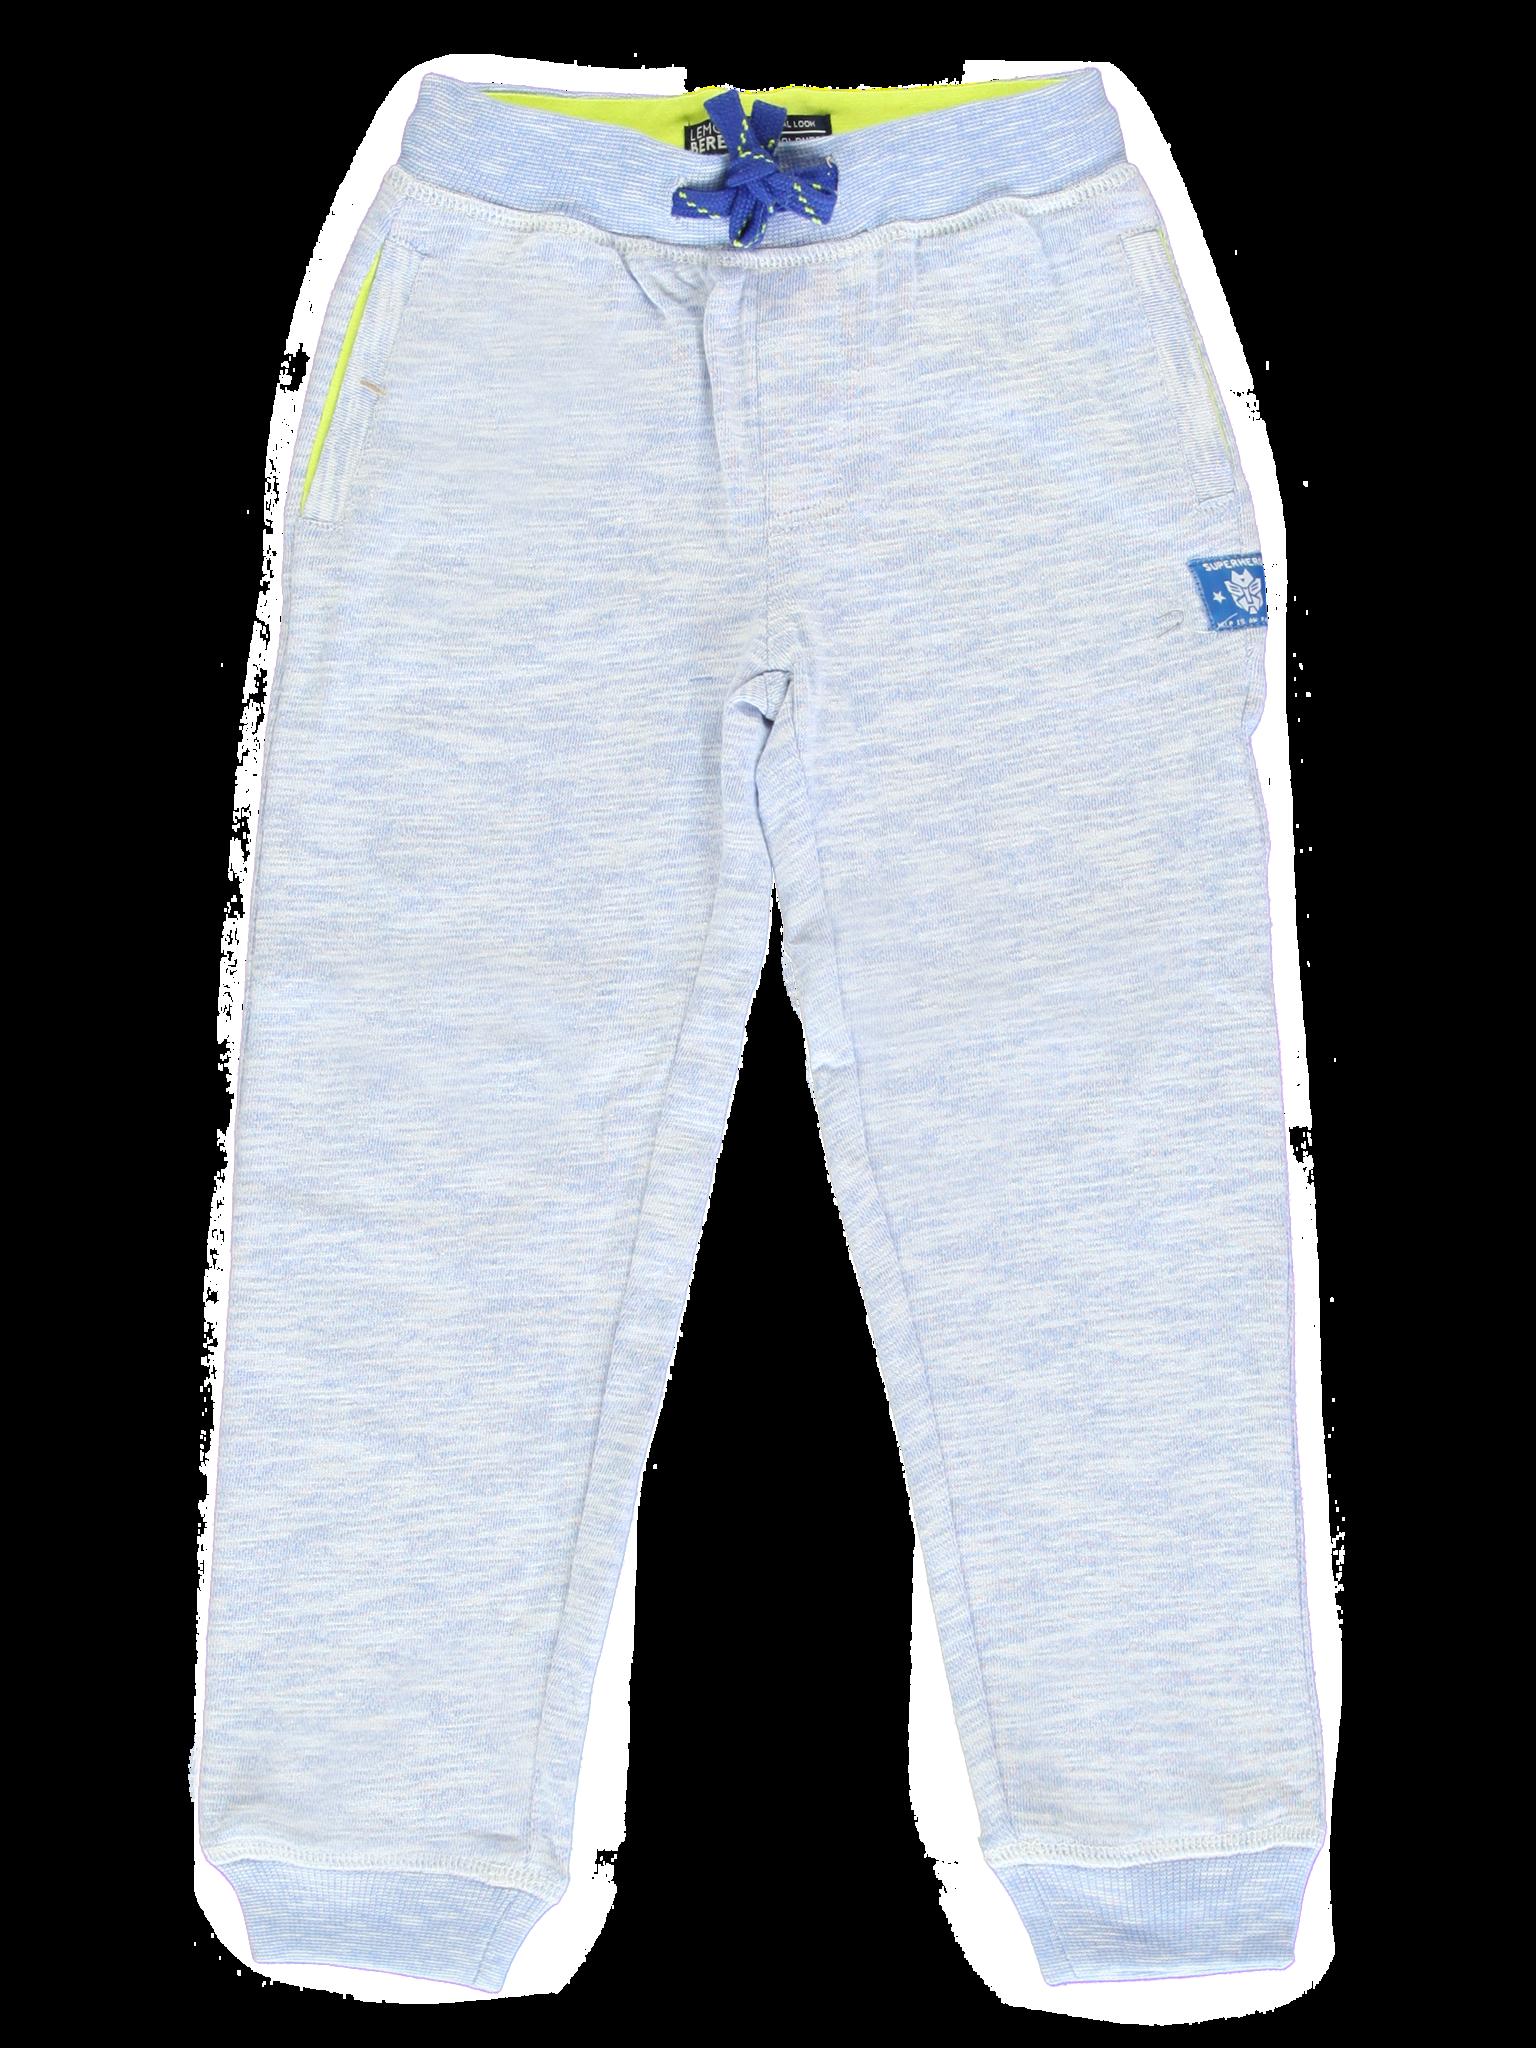 All Brands | Summerproducts Small Boys | Jogging Pant | 10 pcs/box